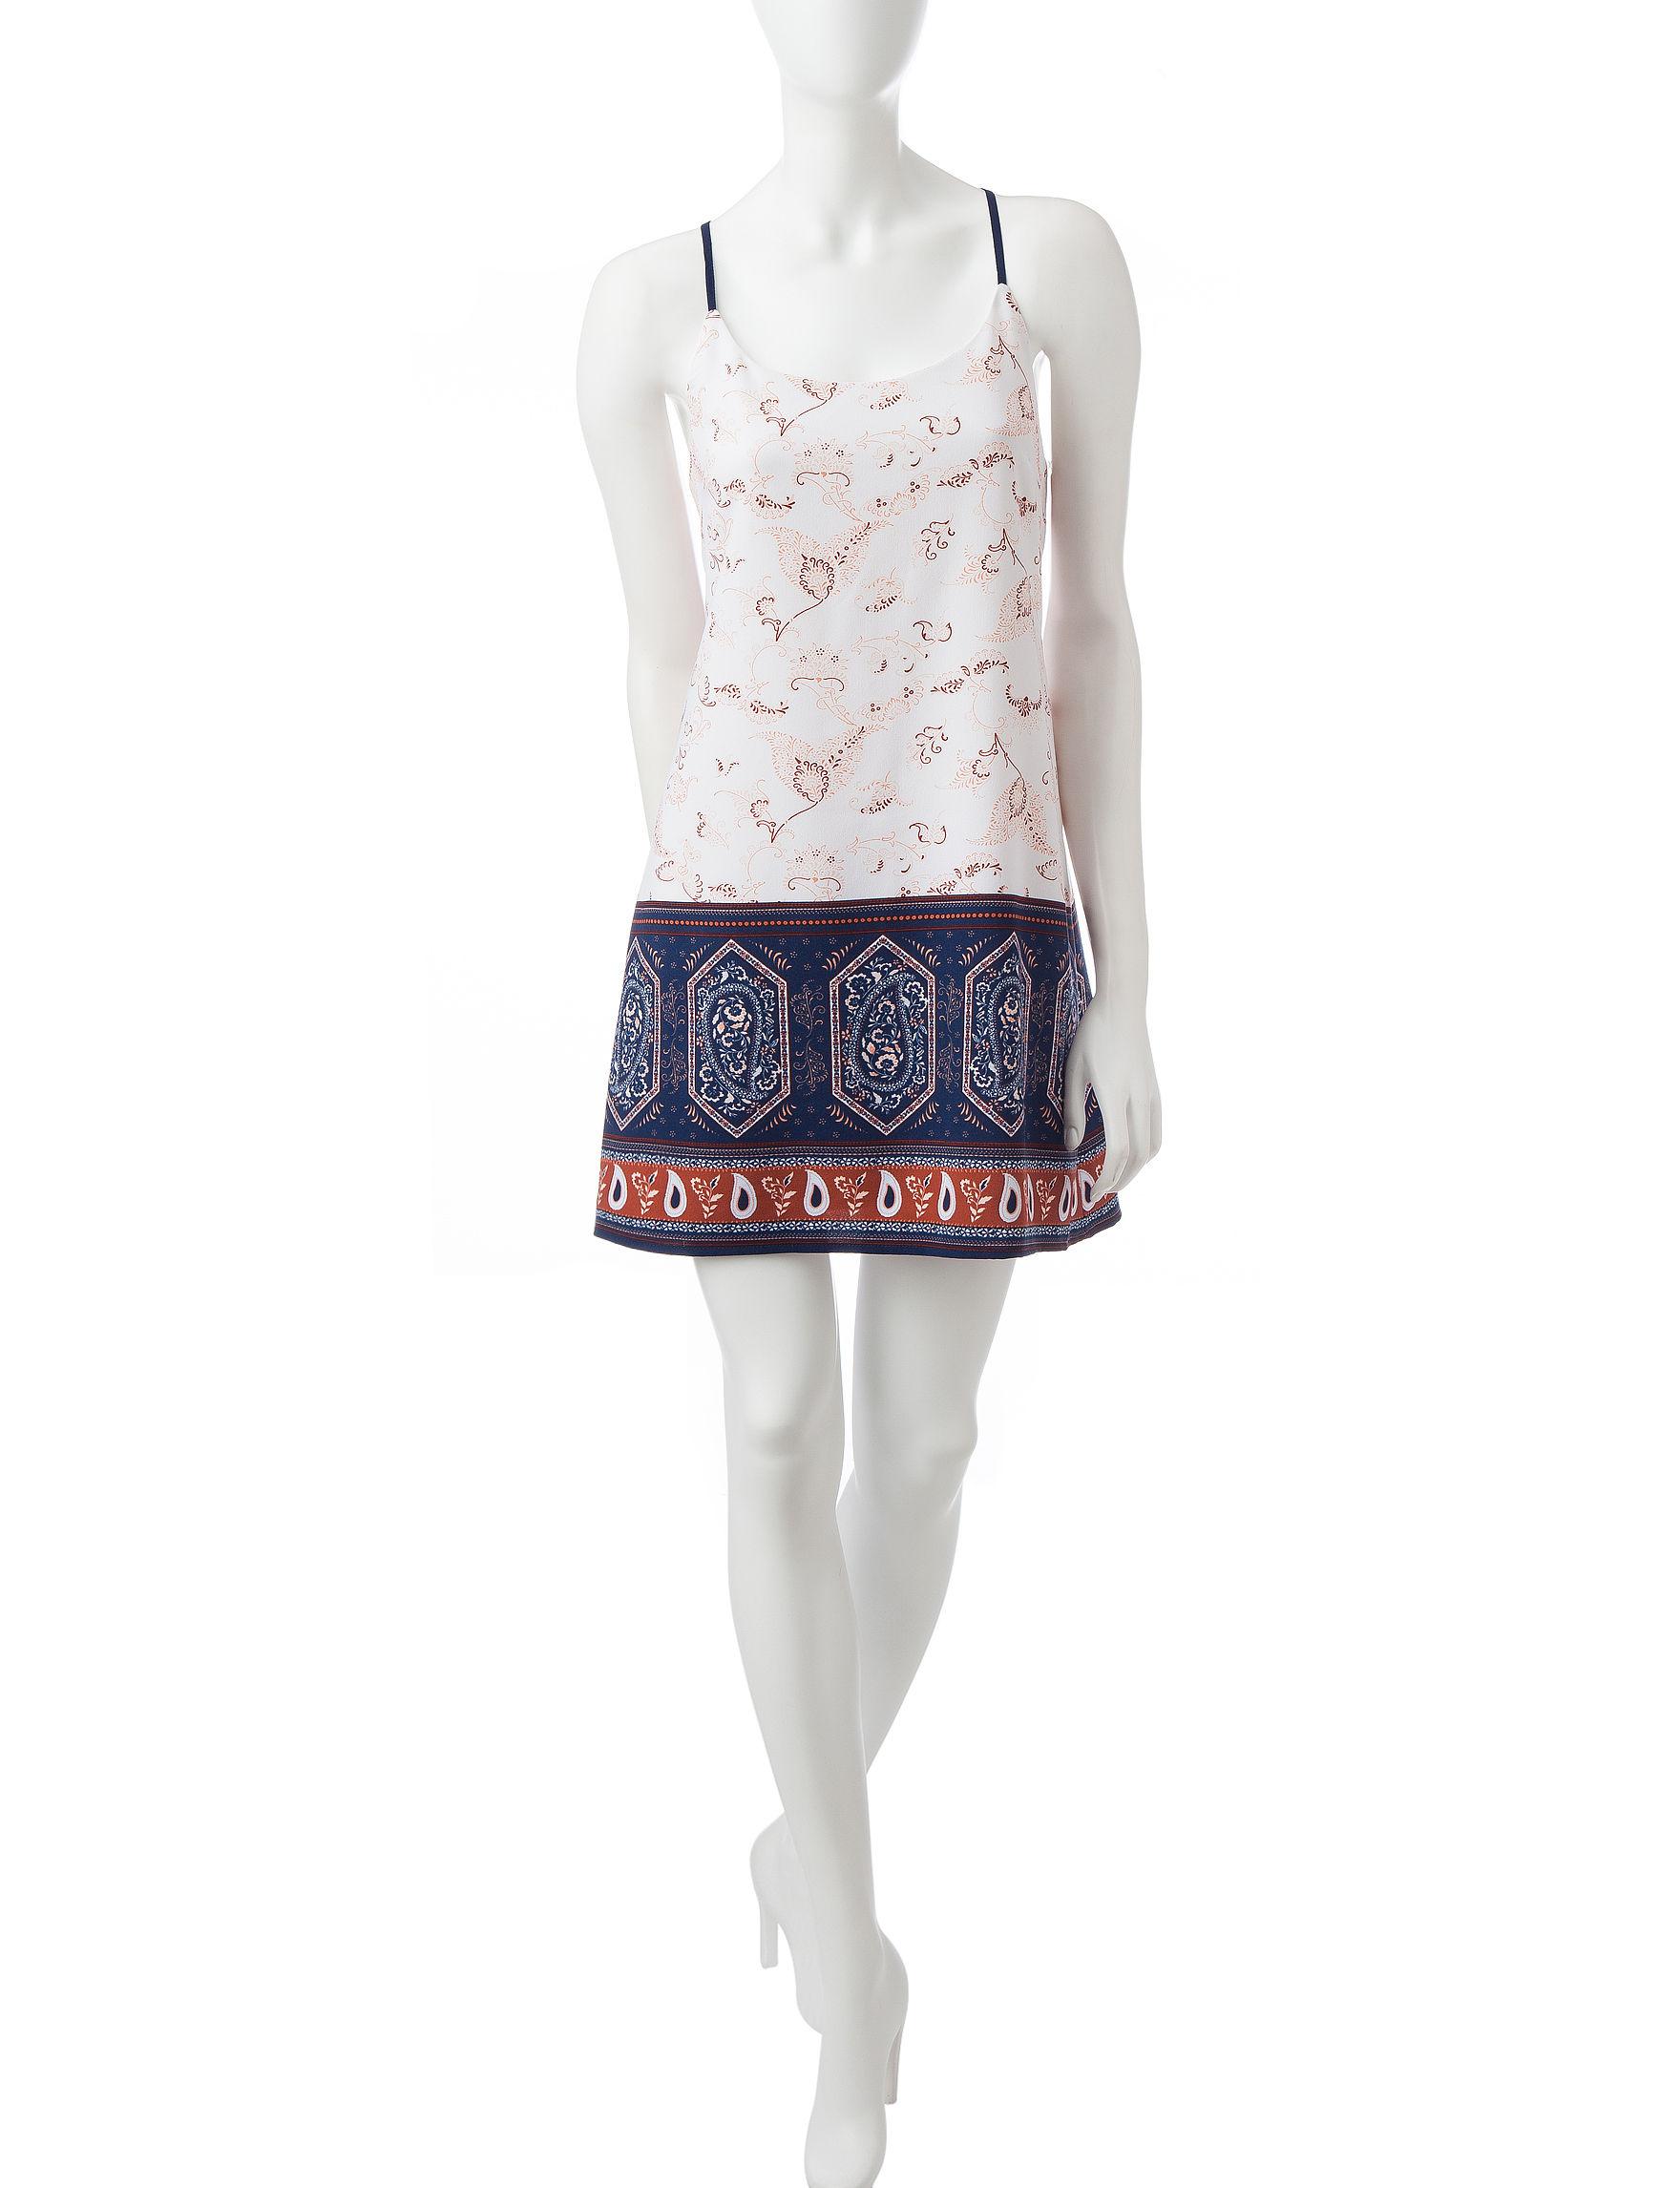 Trixxi Ivory/Navy Shift Dresses